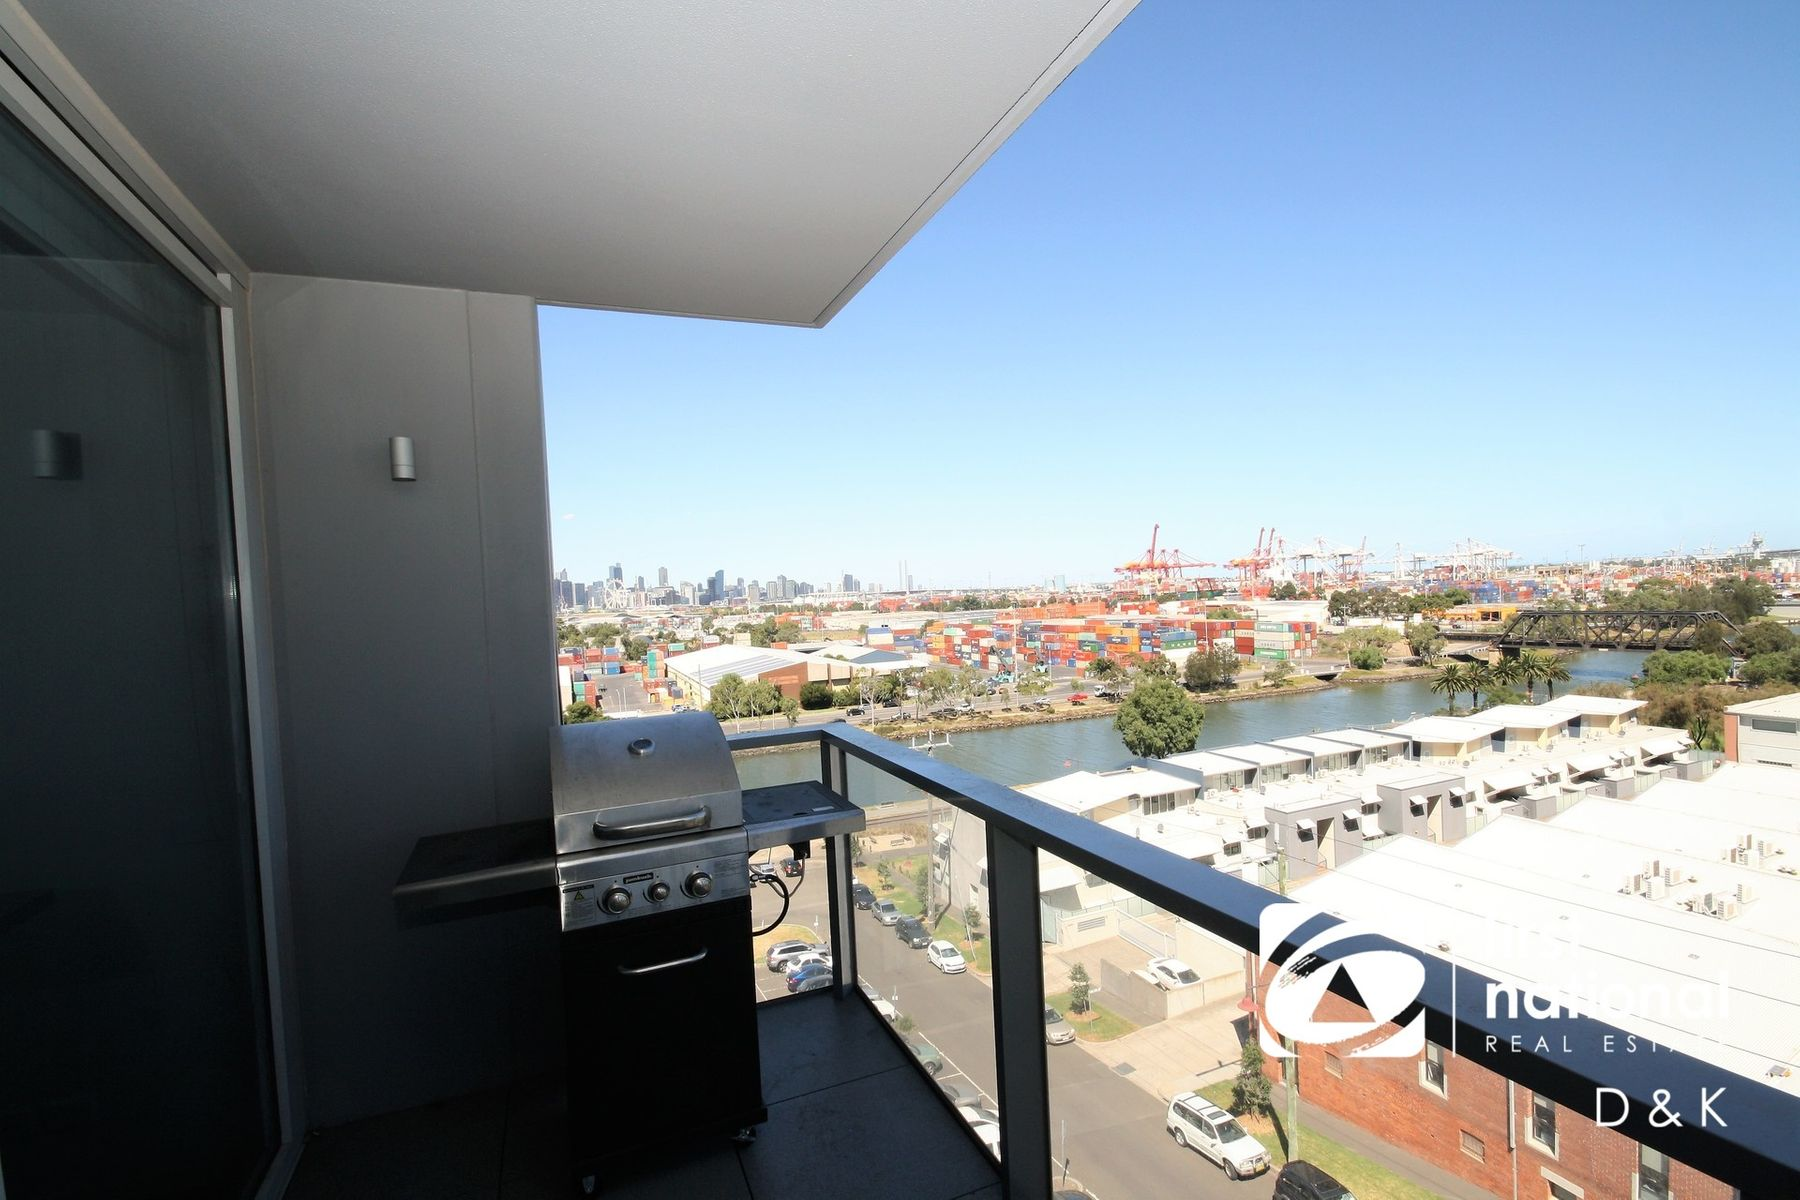 609/1 Moreland Street, Footscray, VIC 3011